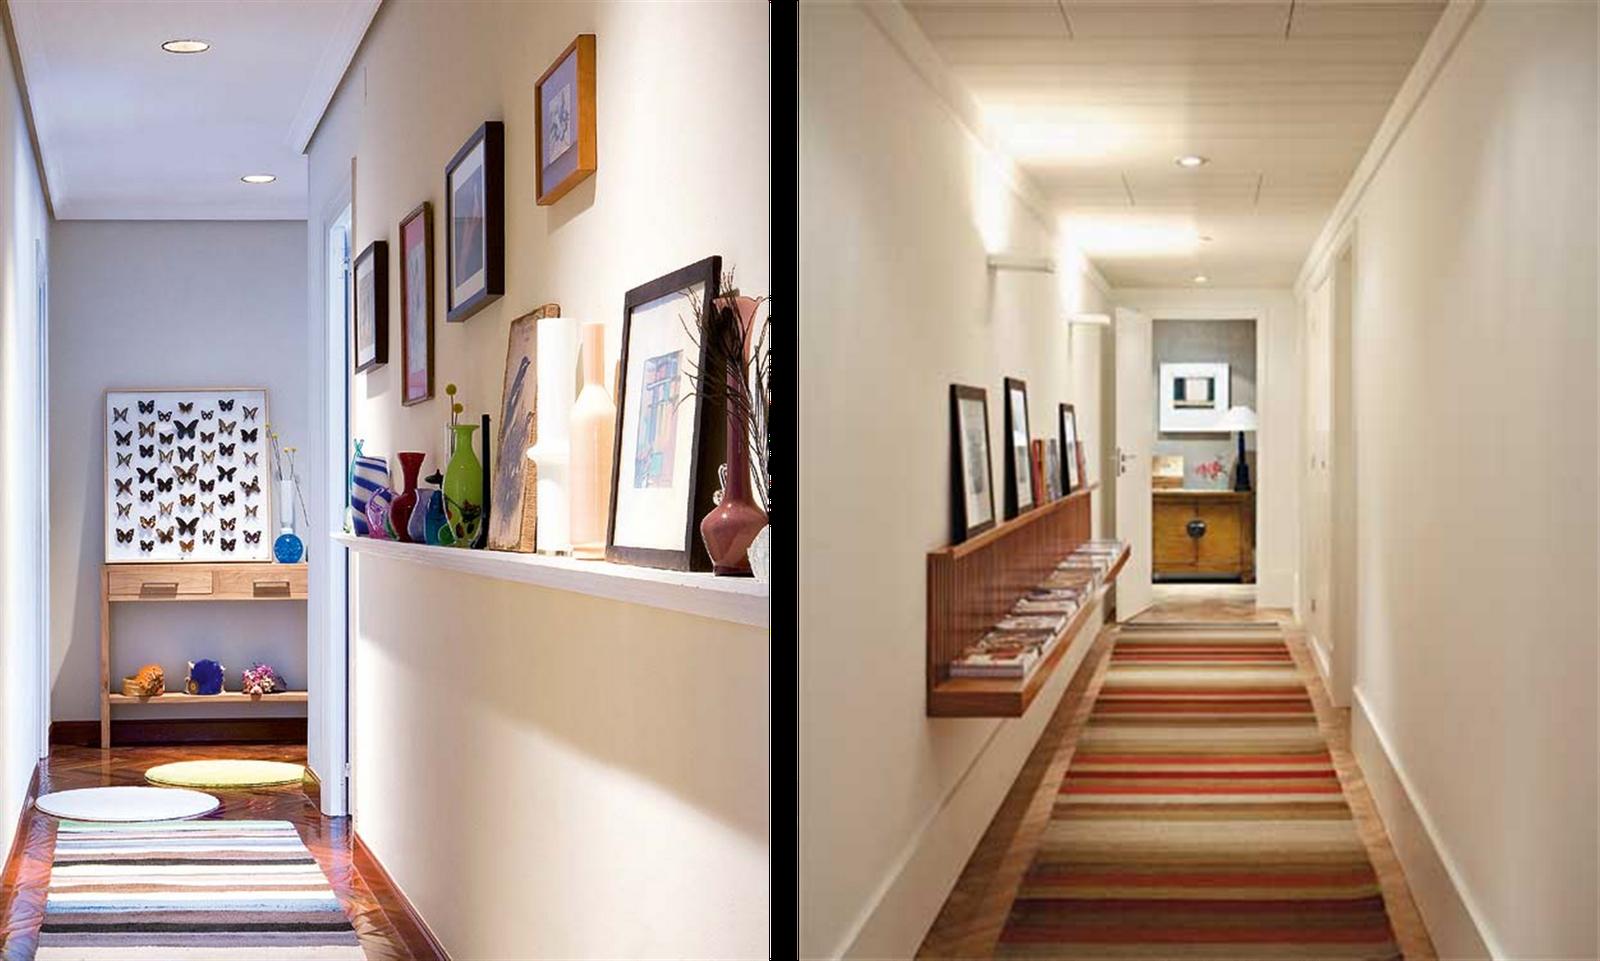 Corredores como aproveitar for Como decorar nuestra casa